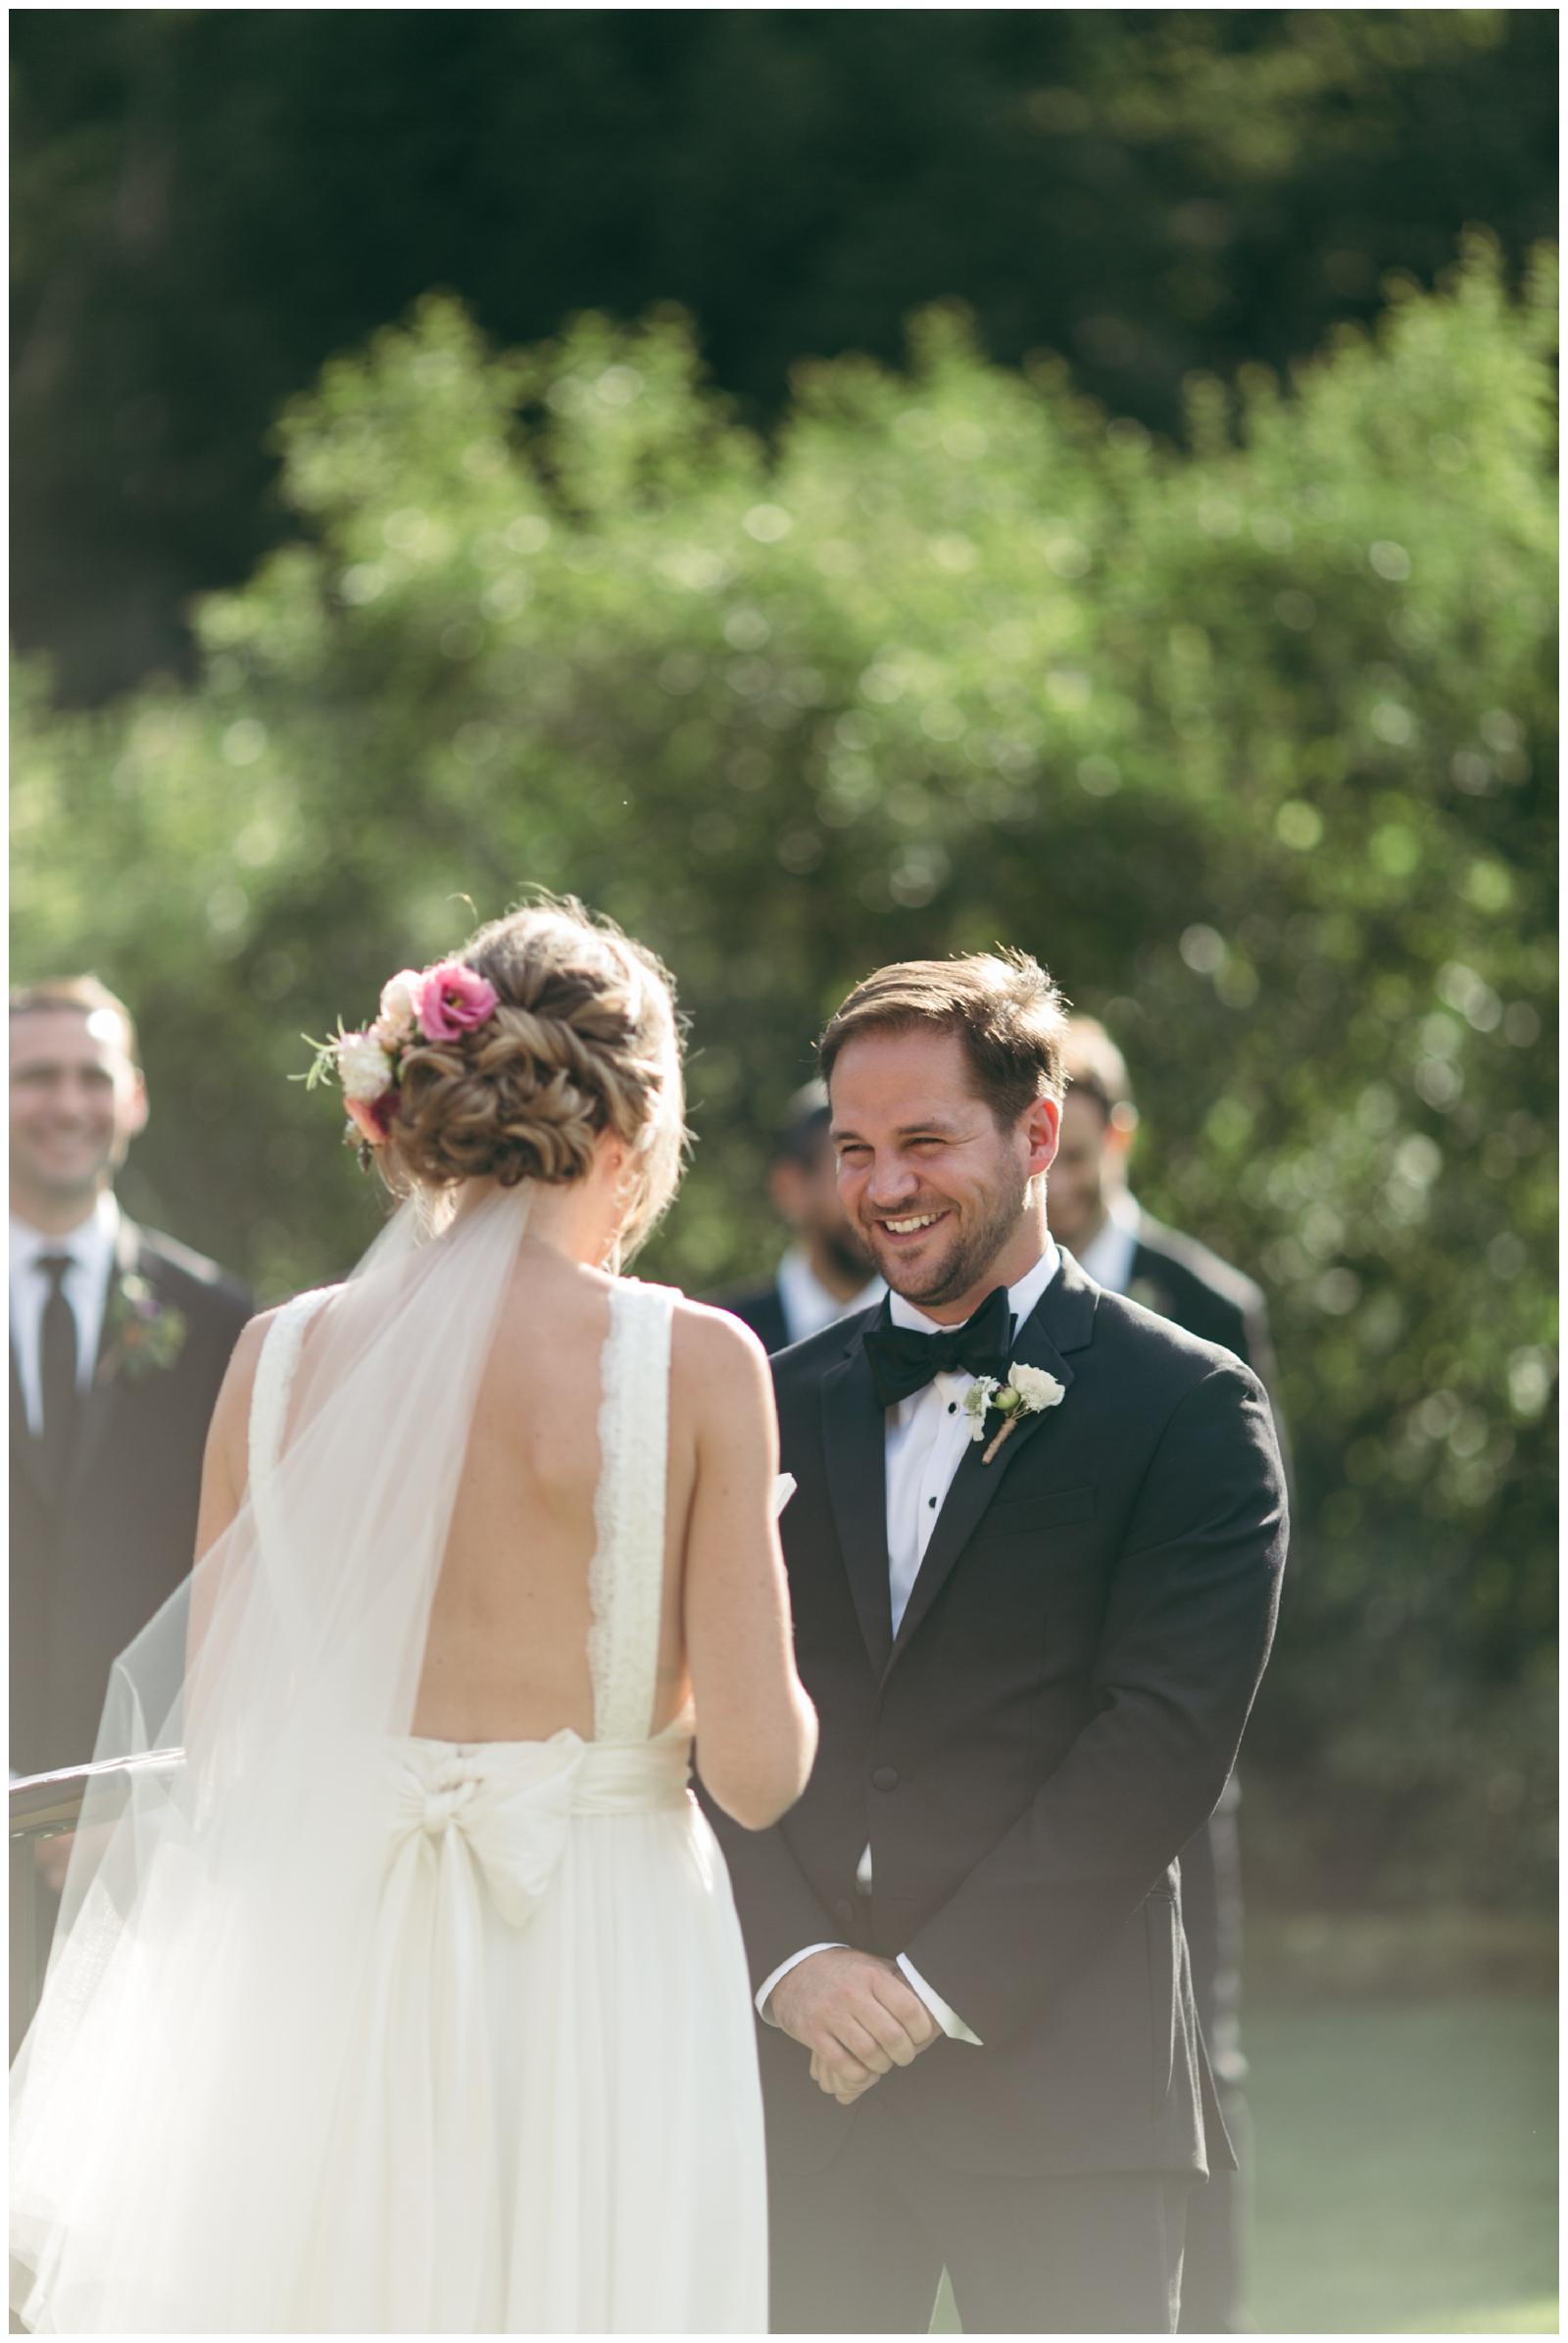 Moraine-Farm-wedding-Bailey-Q-Photo-Massachusetts-wedding-photpgrapher-075.jpg